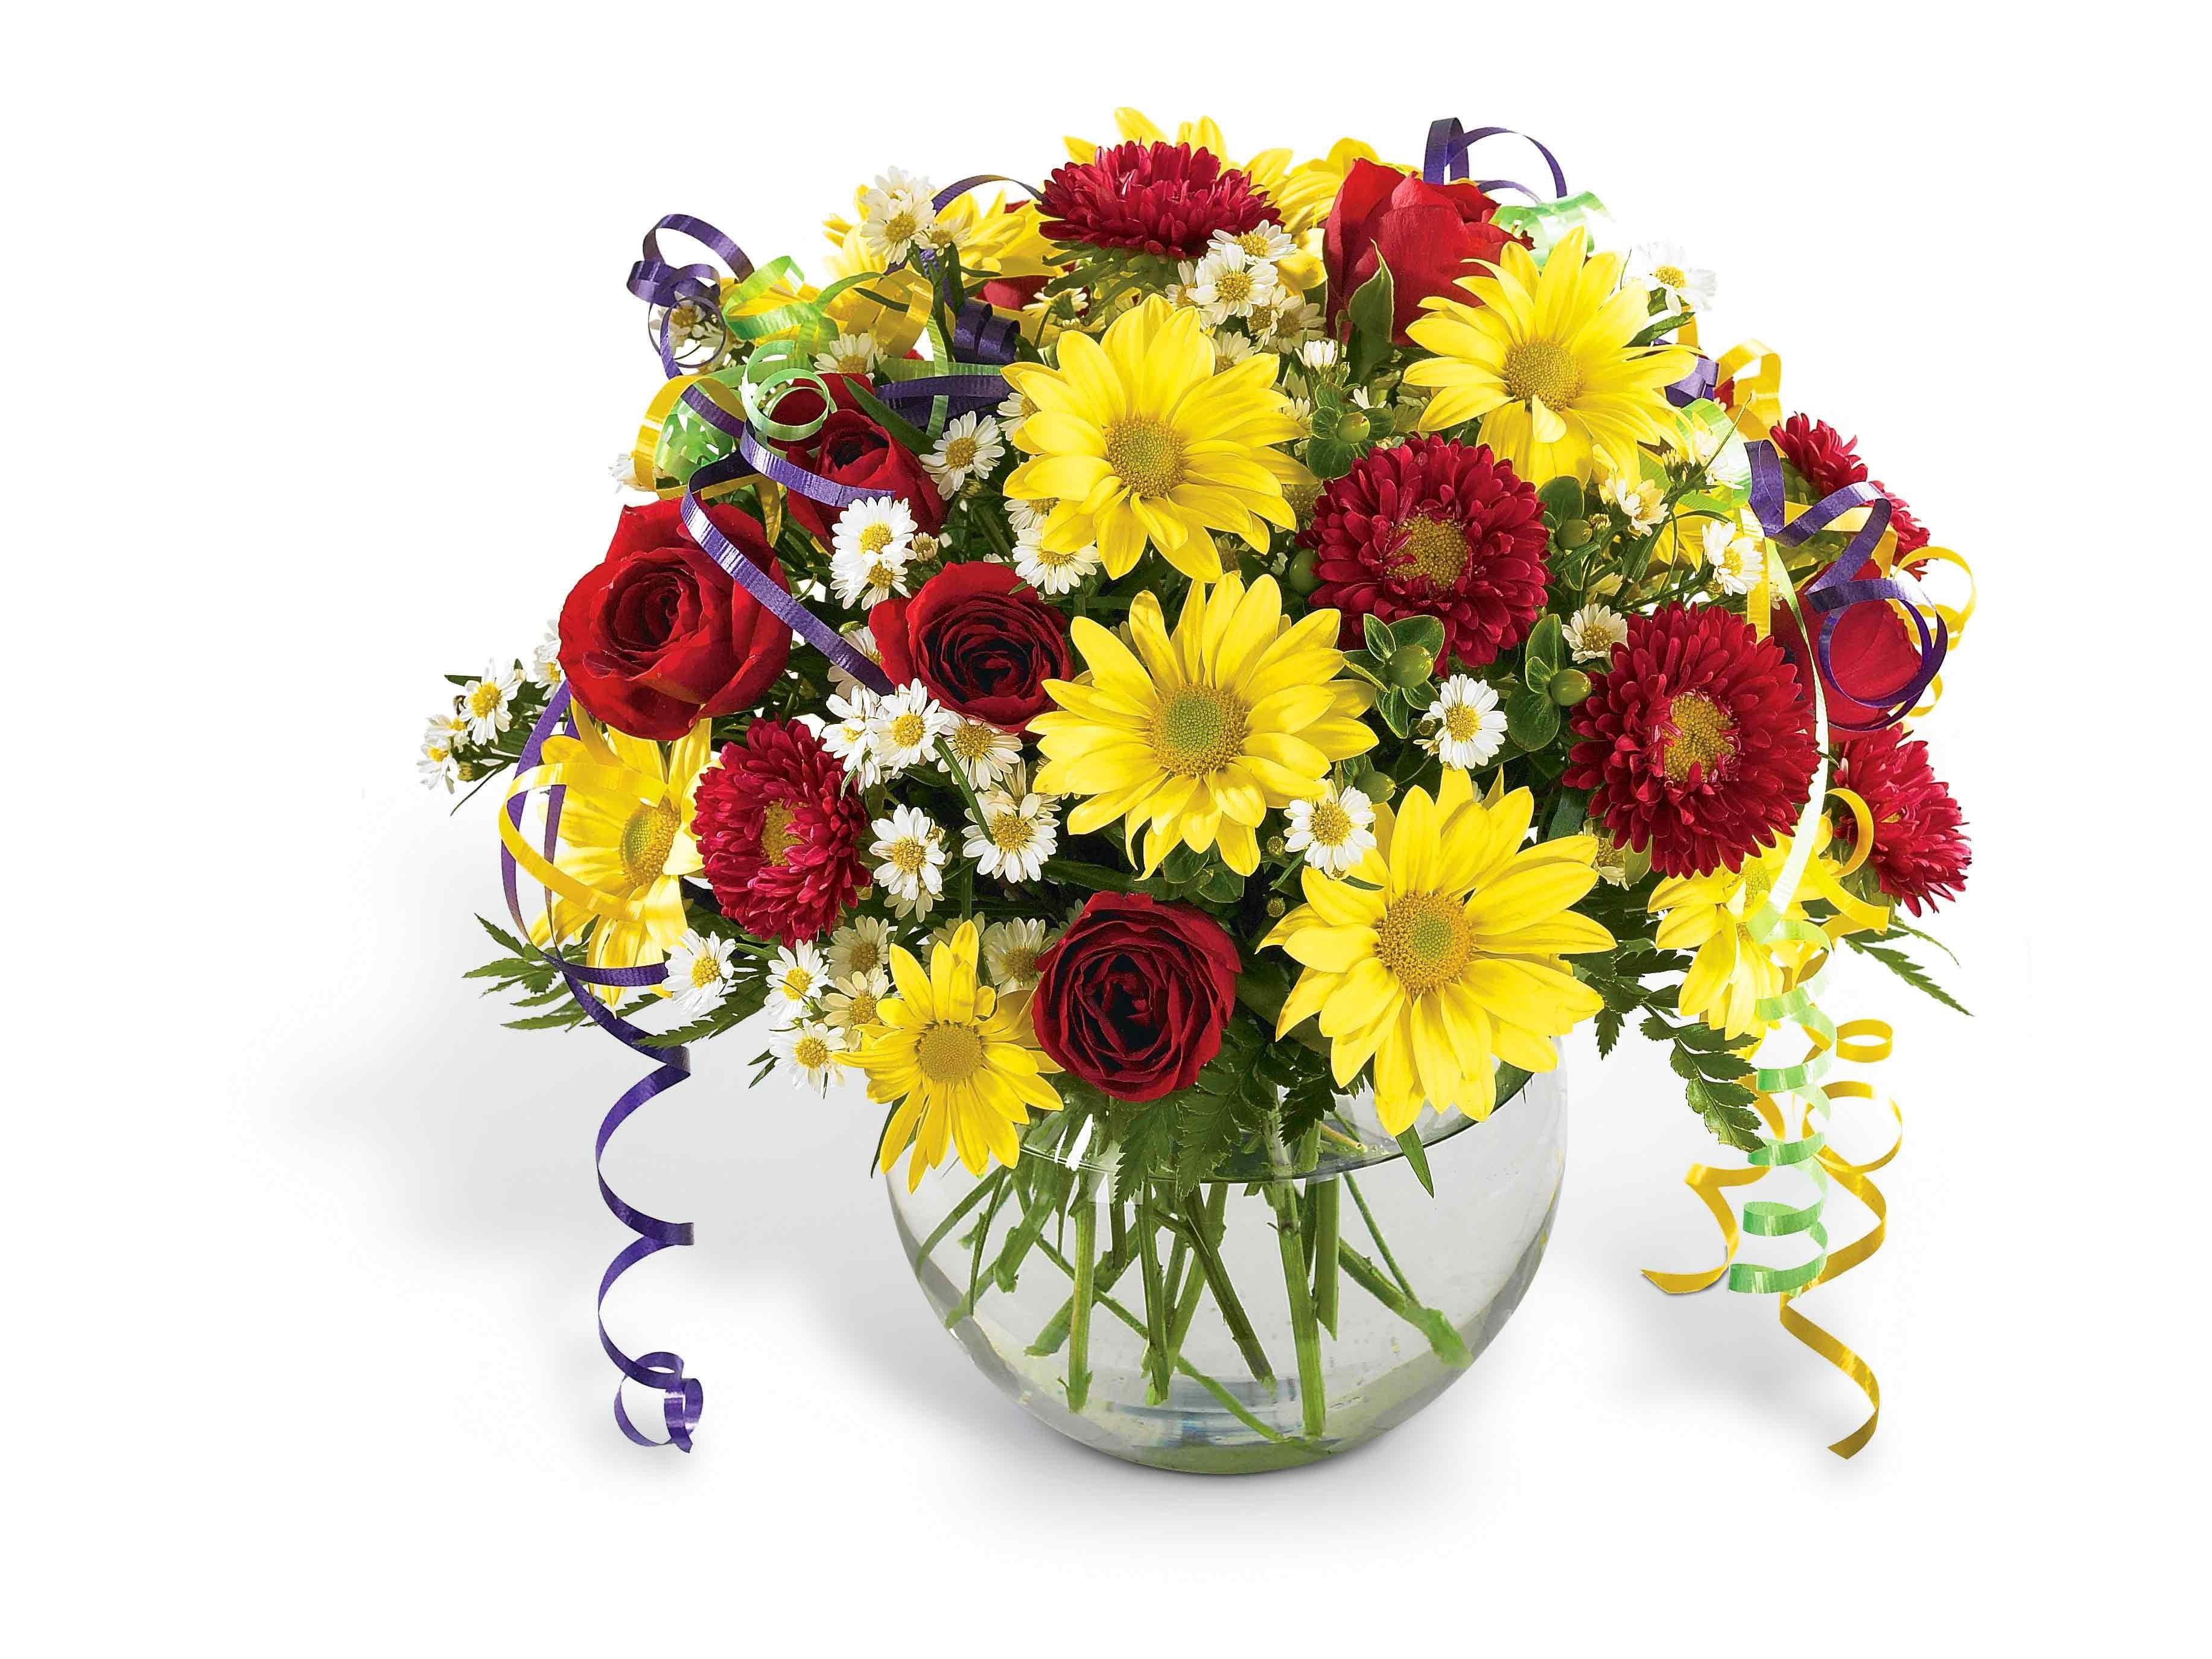 Flower Bouquet Wallpapers